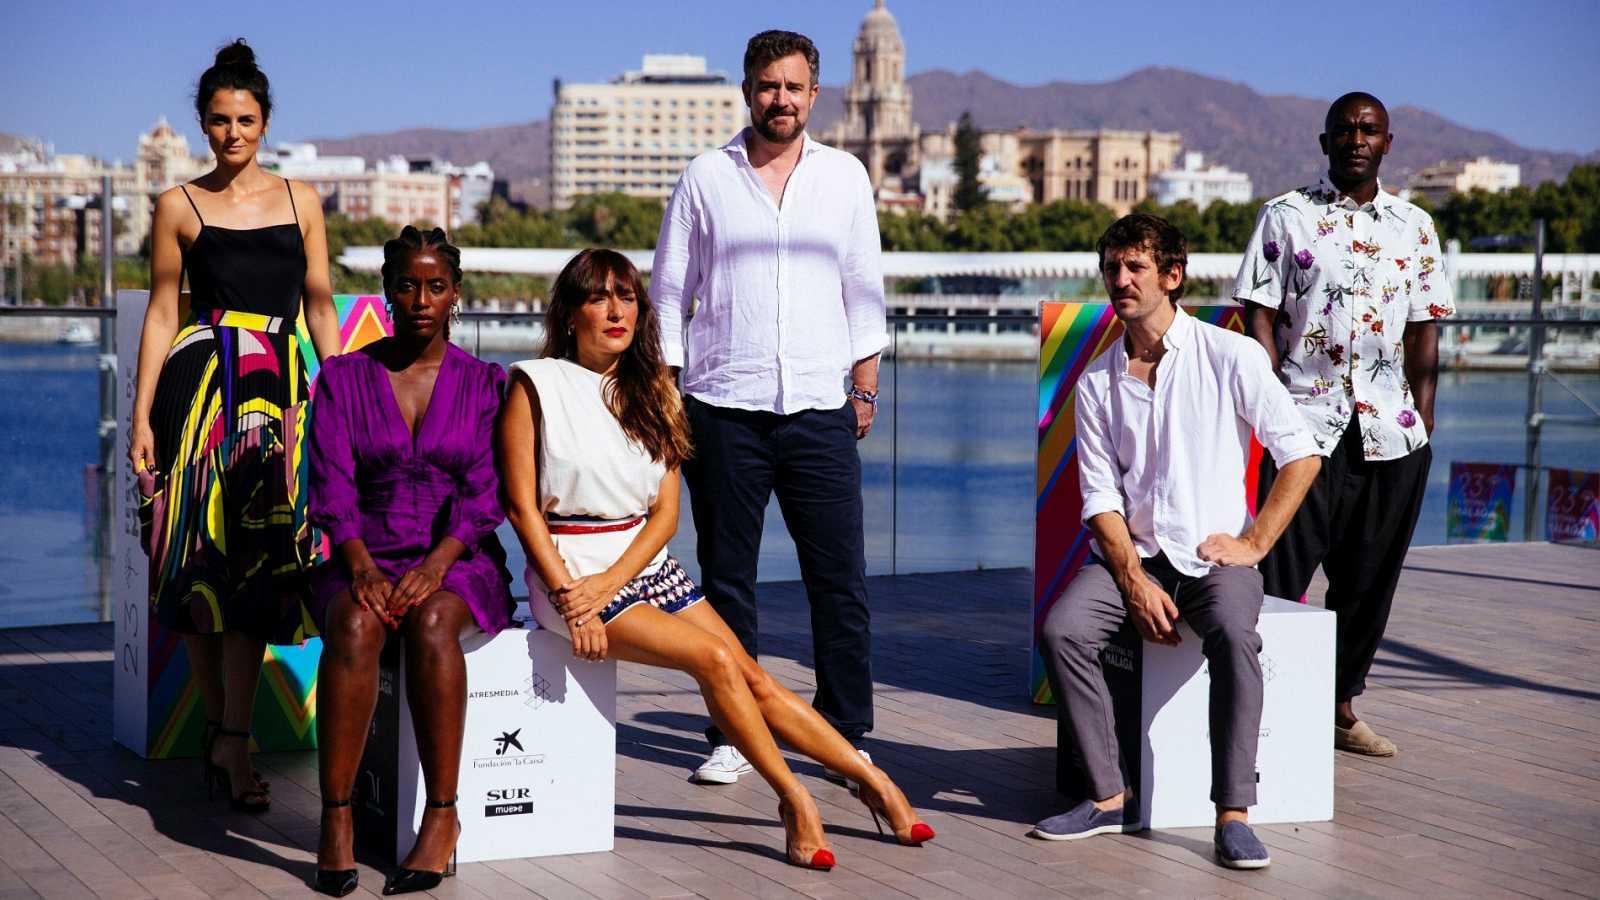 Candela Peña y Raúl Arevalo presentan en el Festival de Málaga 'Black Beach', de Esteban Crespo